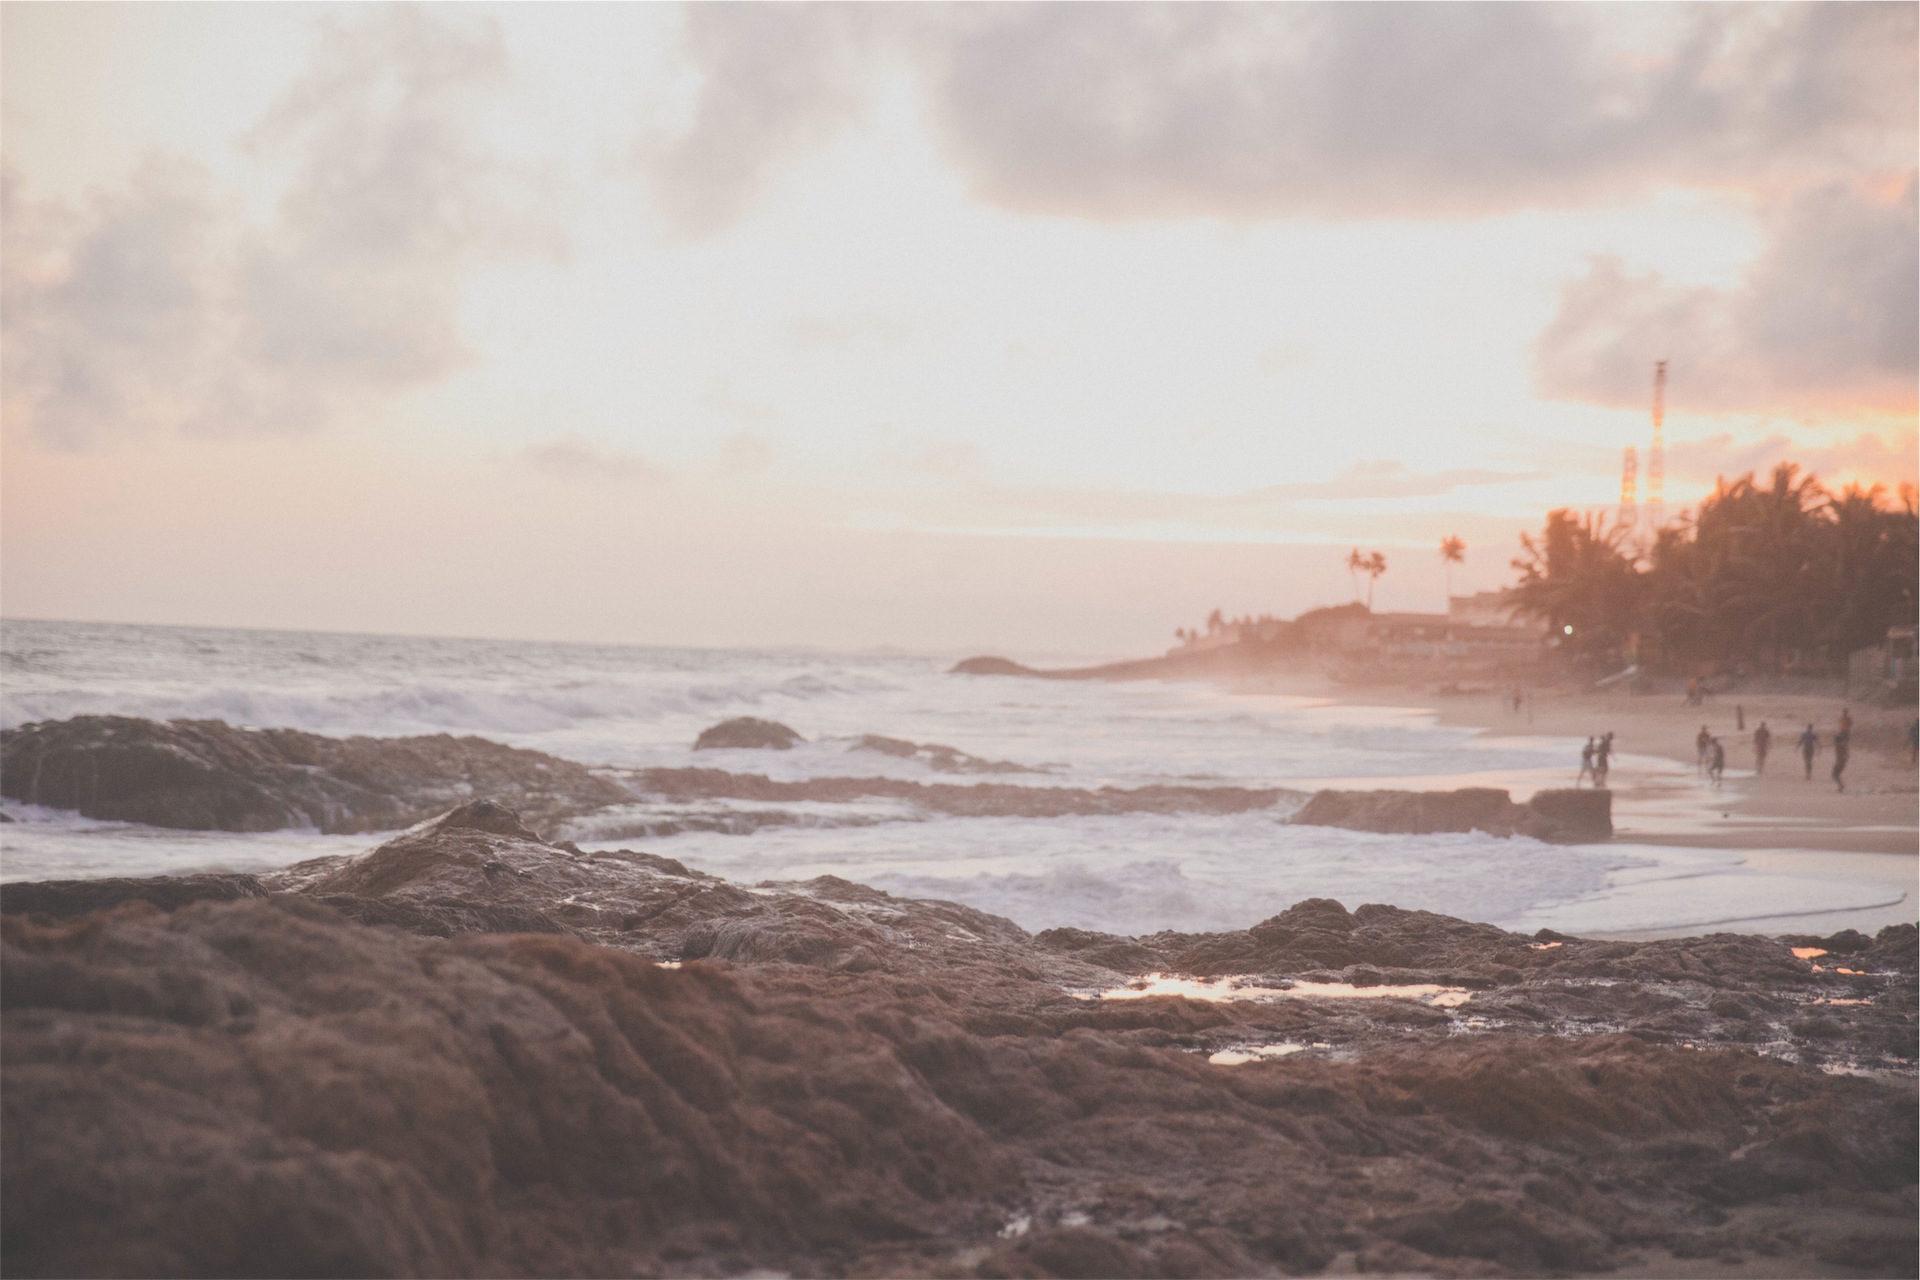 Rocas, Παραλία, Άμμος, Χαλαρώστε, Ηλιοβασίλεμα - Wallpapers HD - Professor-falken.com